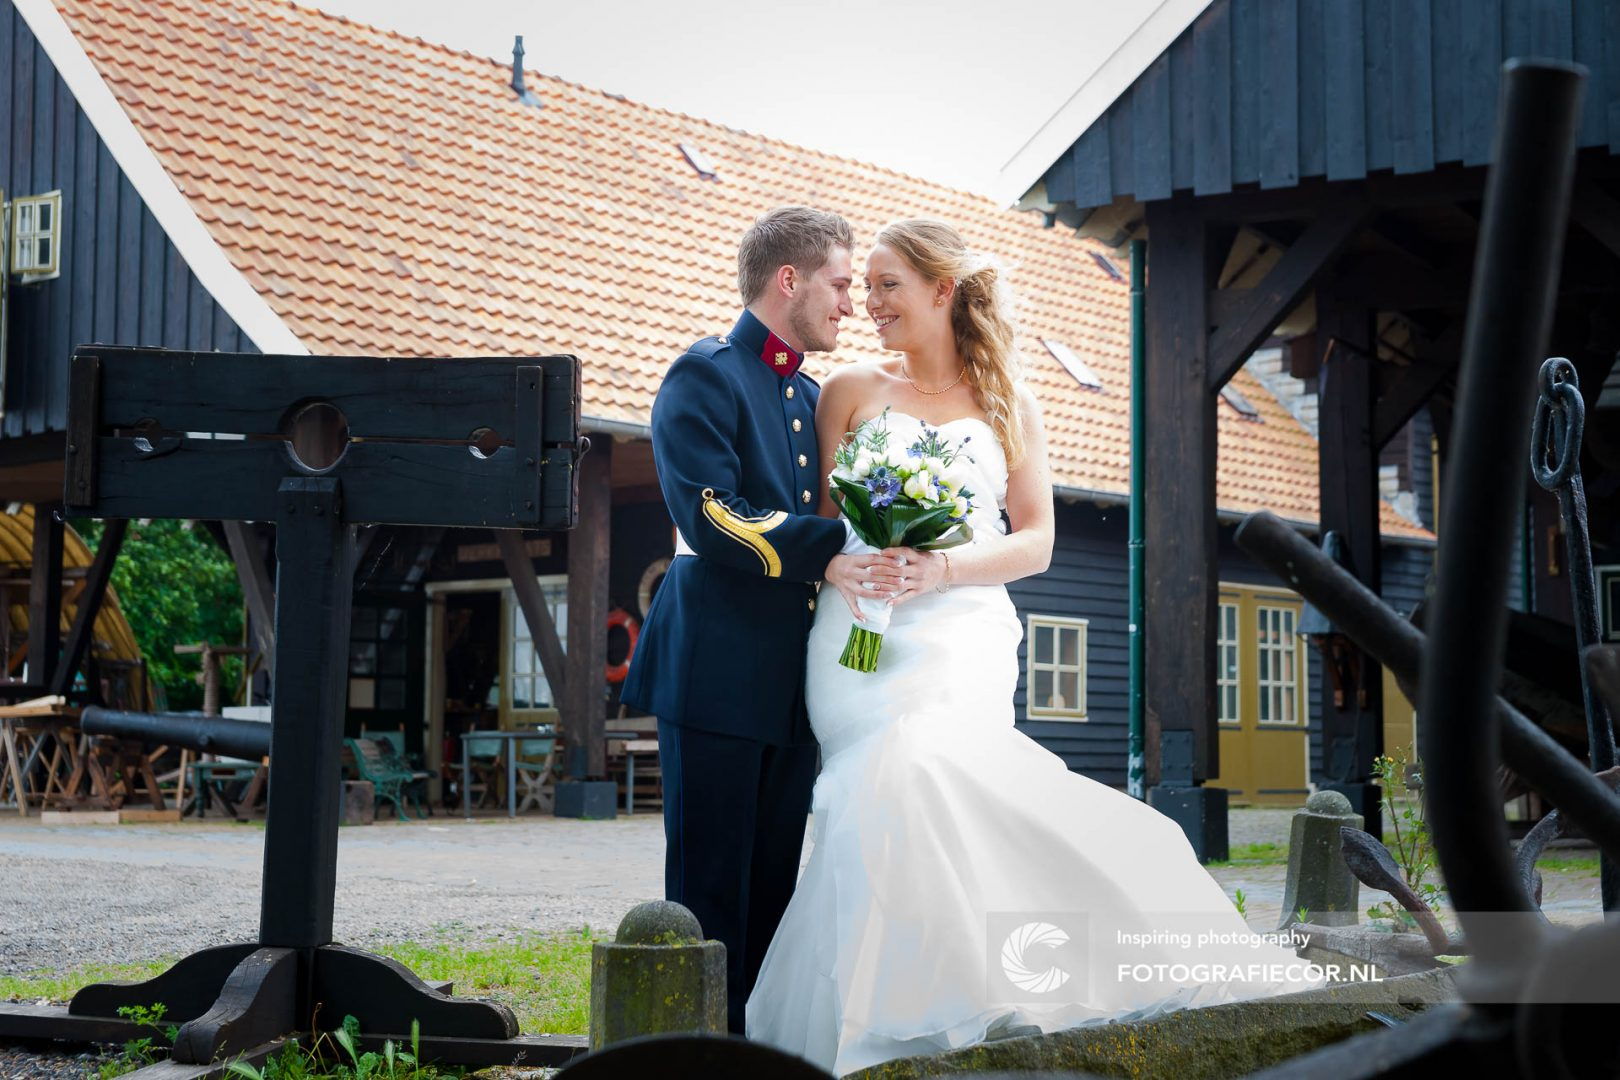 trouwfoto | Koggewerf | trouwreportage | huwelijk | fotograaf | foto | locatie | Trouwen